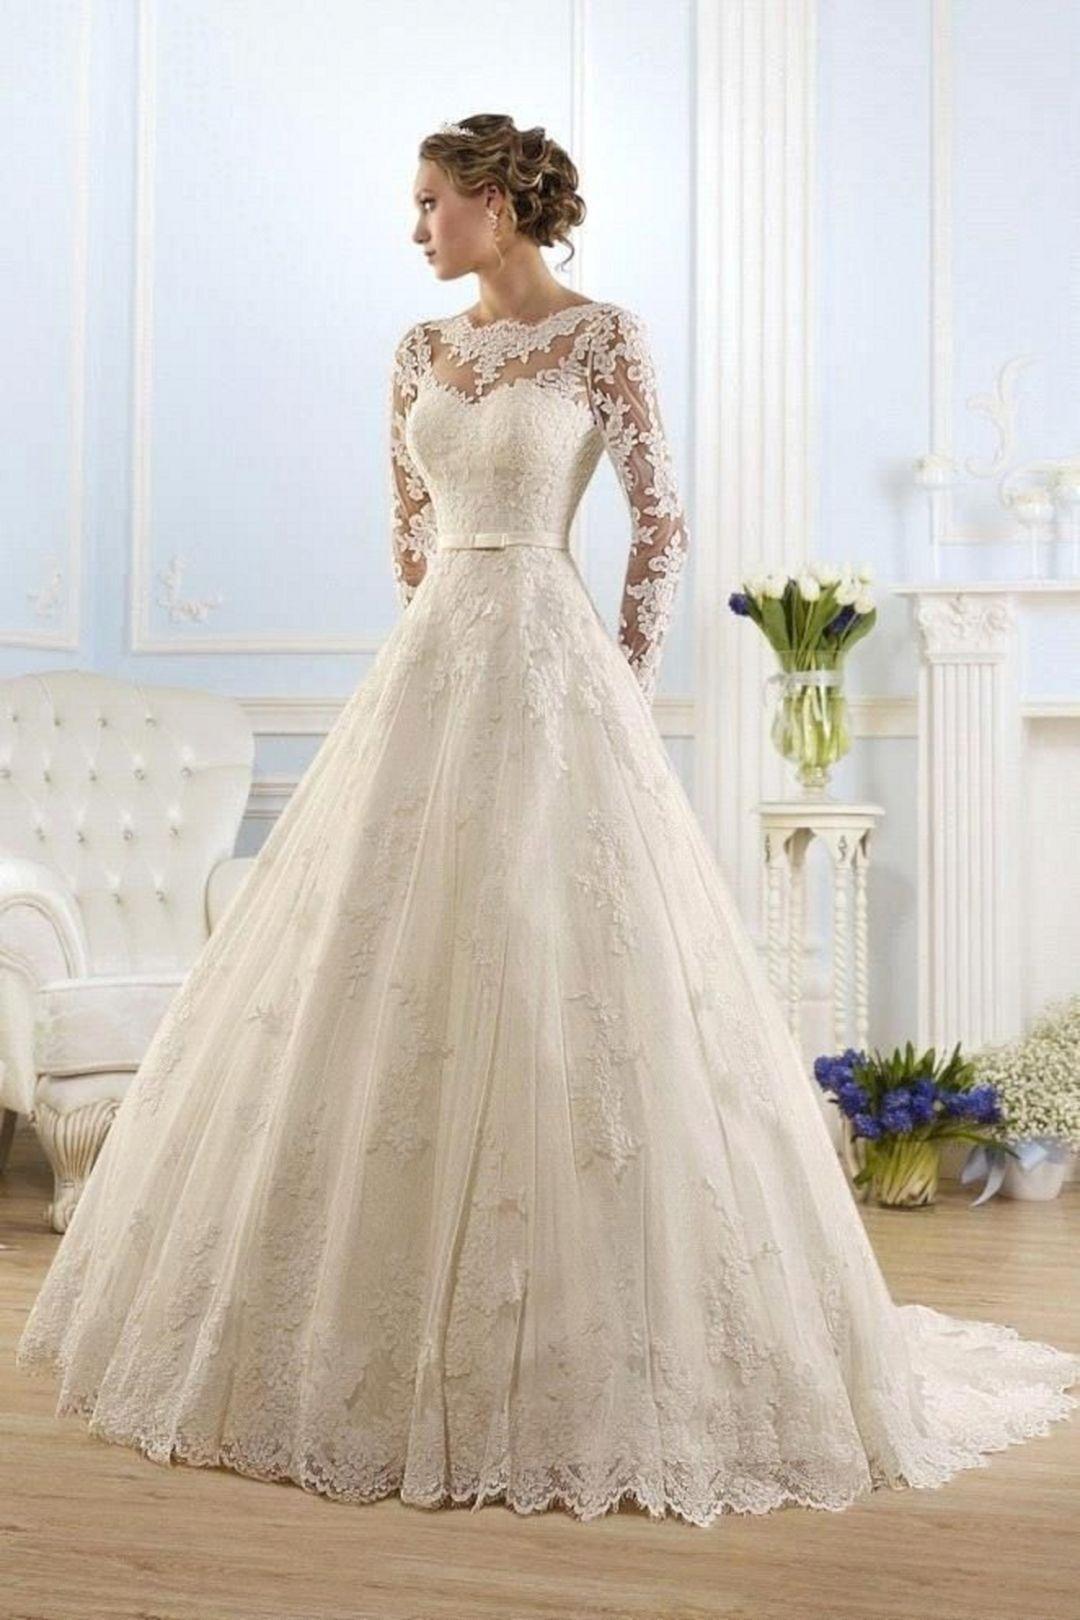 15+ Elegant Long Sleeve Wedding Dress Style Ideas You Have It